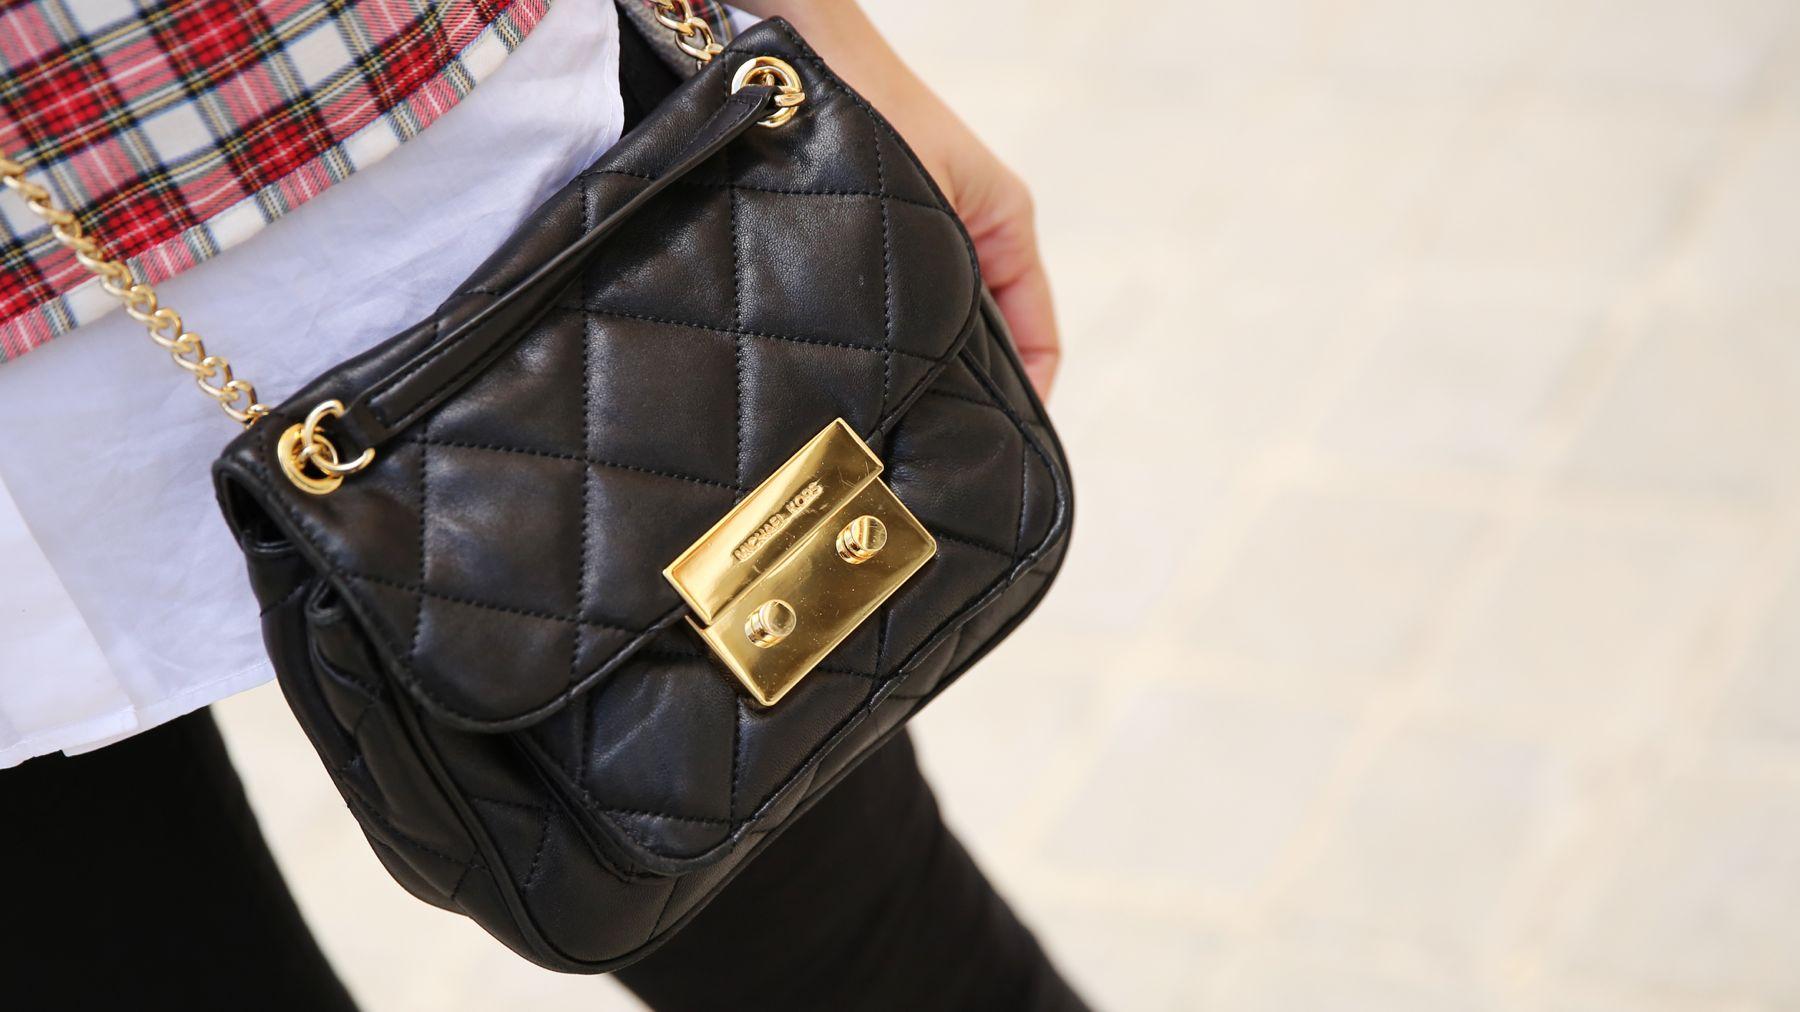 trendy_taste-look-outfit-street_style-ootd-blog-blogger-fashion-spain-moda-españa-steve-madden-plaid-shirt-camisa-cuadros-skinny-jeans-pitillos-negros-8